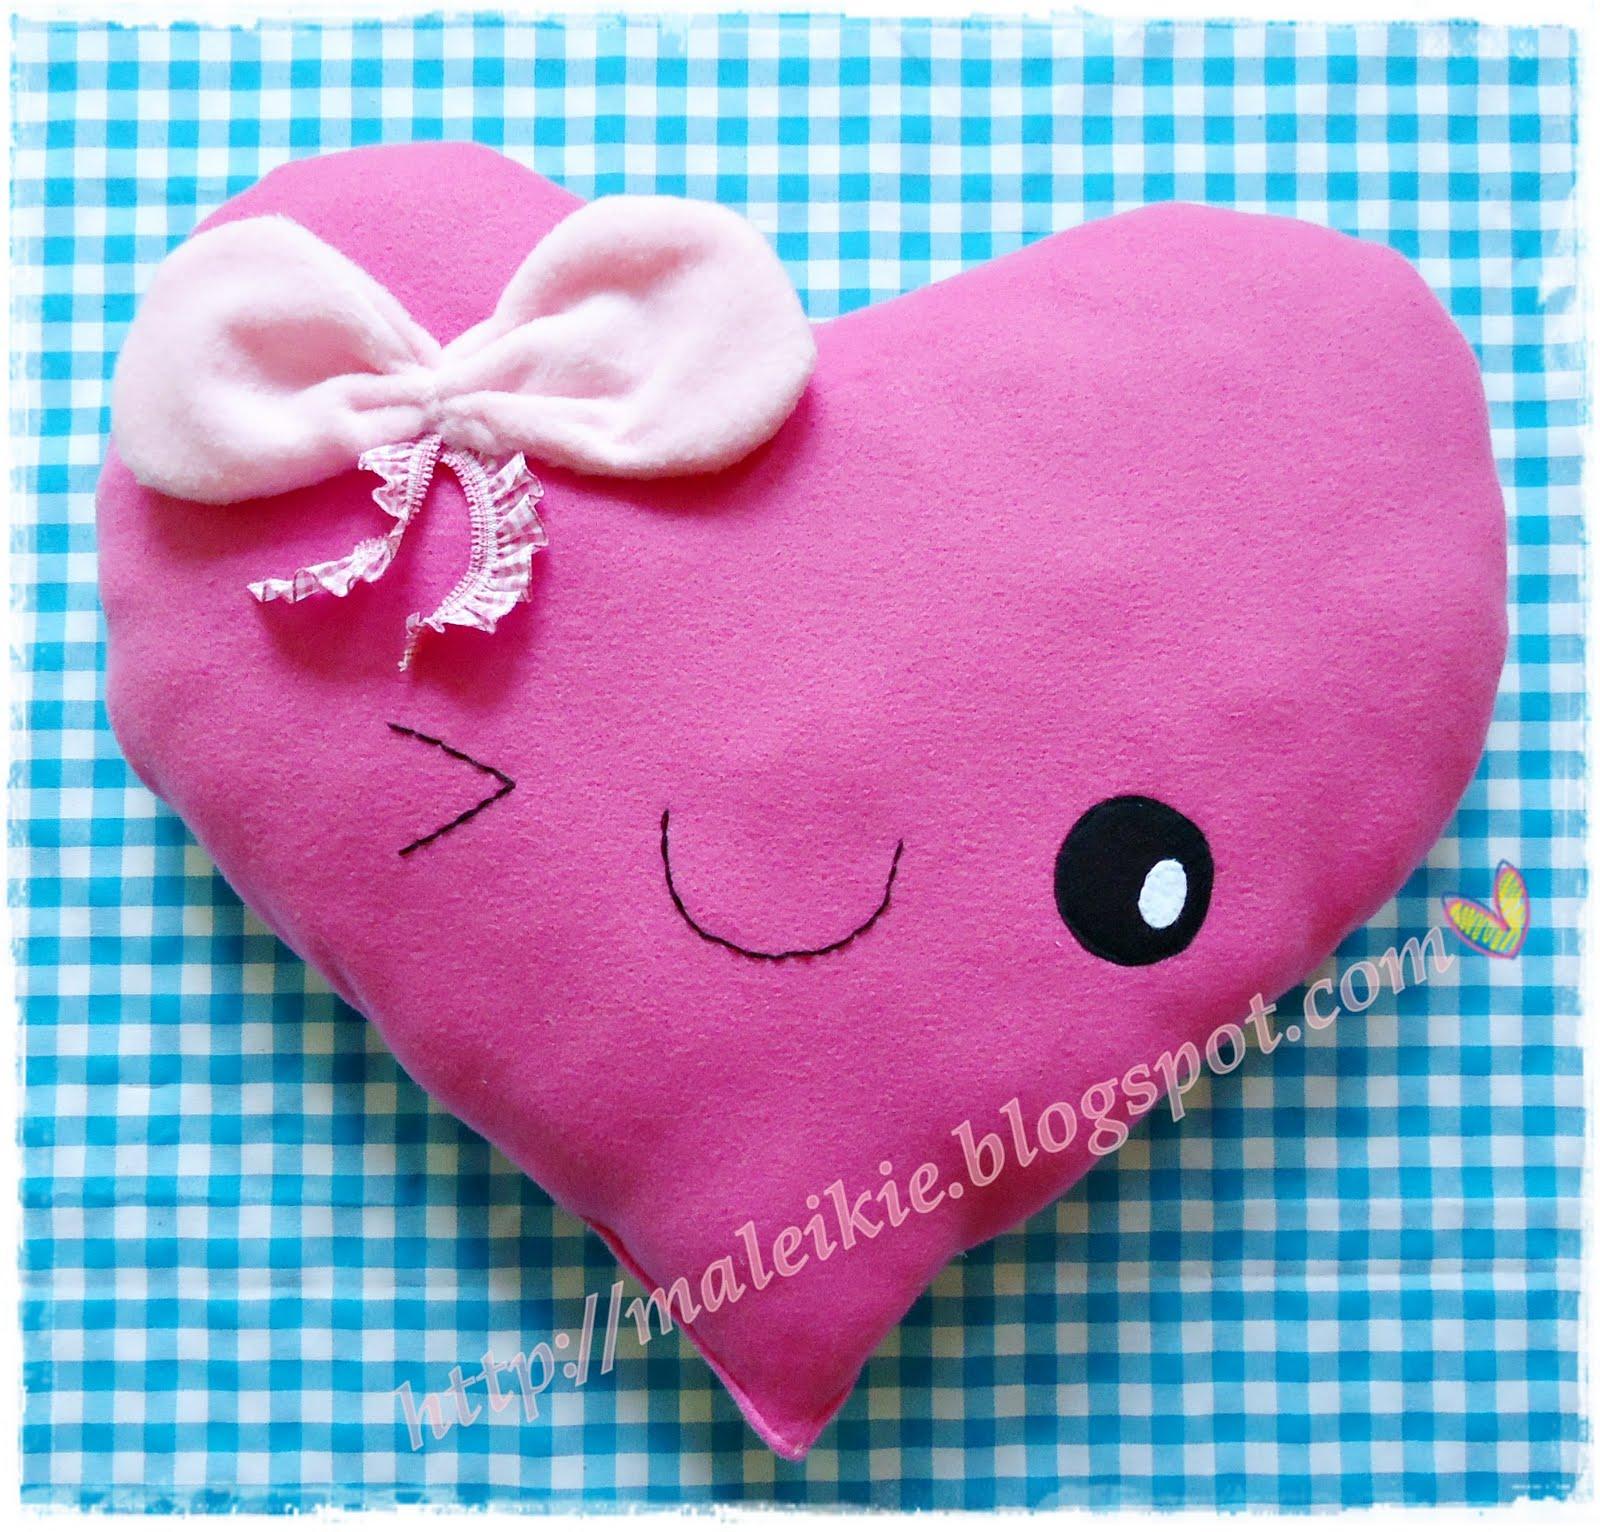 Cute Pillow Crafts : Chunkylicious Kawaii crafts : cute craft: sweetheart pillow